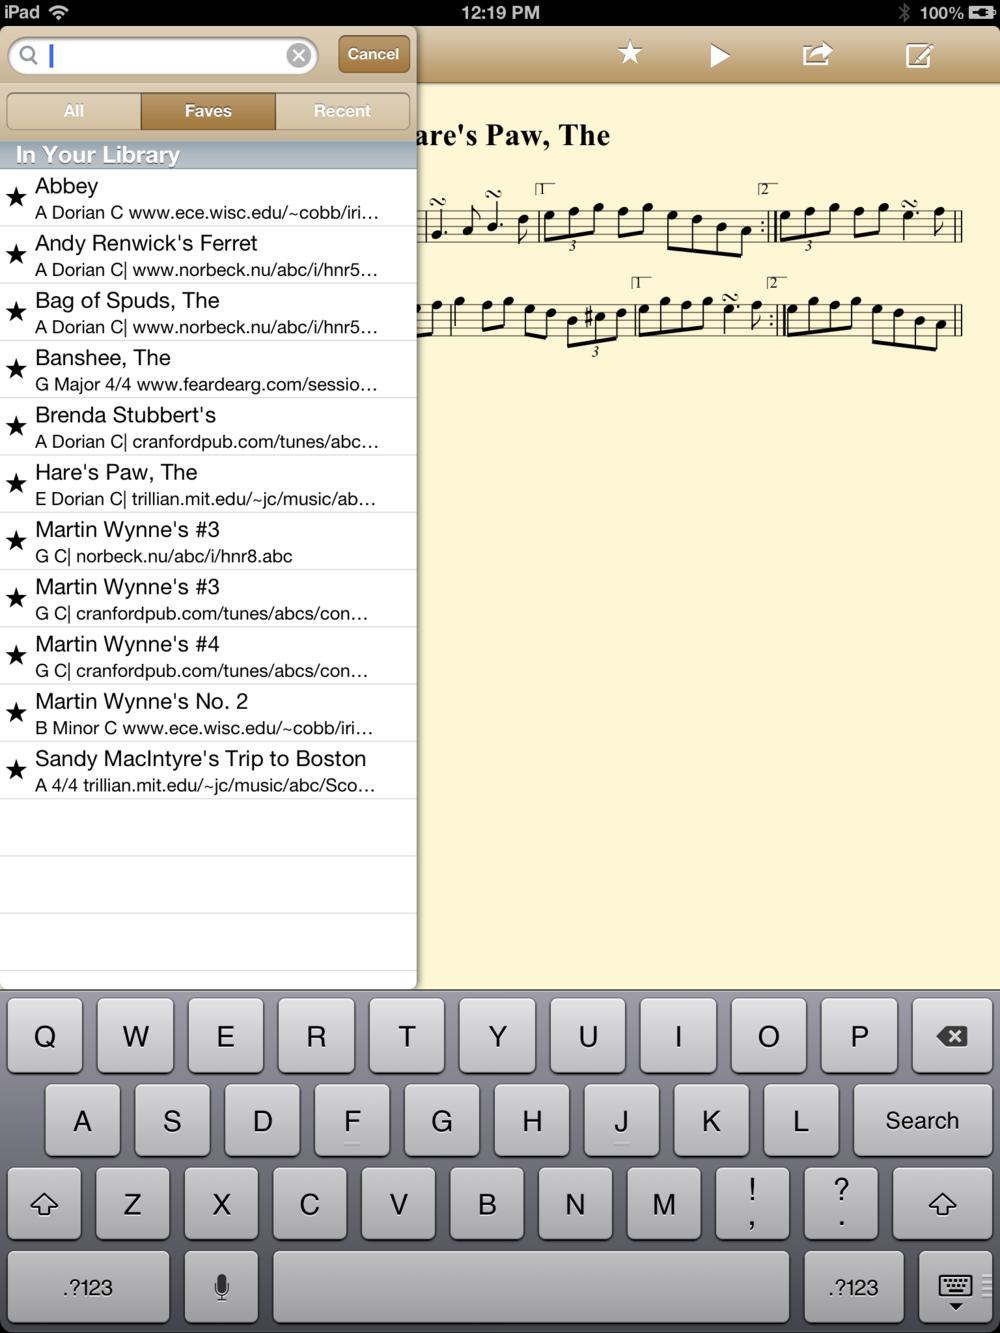 Screenshot 2012.12.08 12.19.06.png